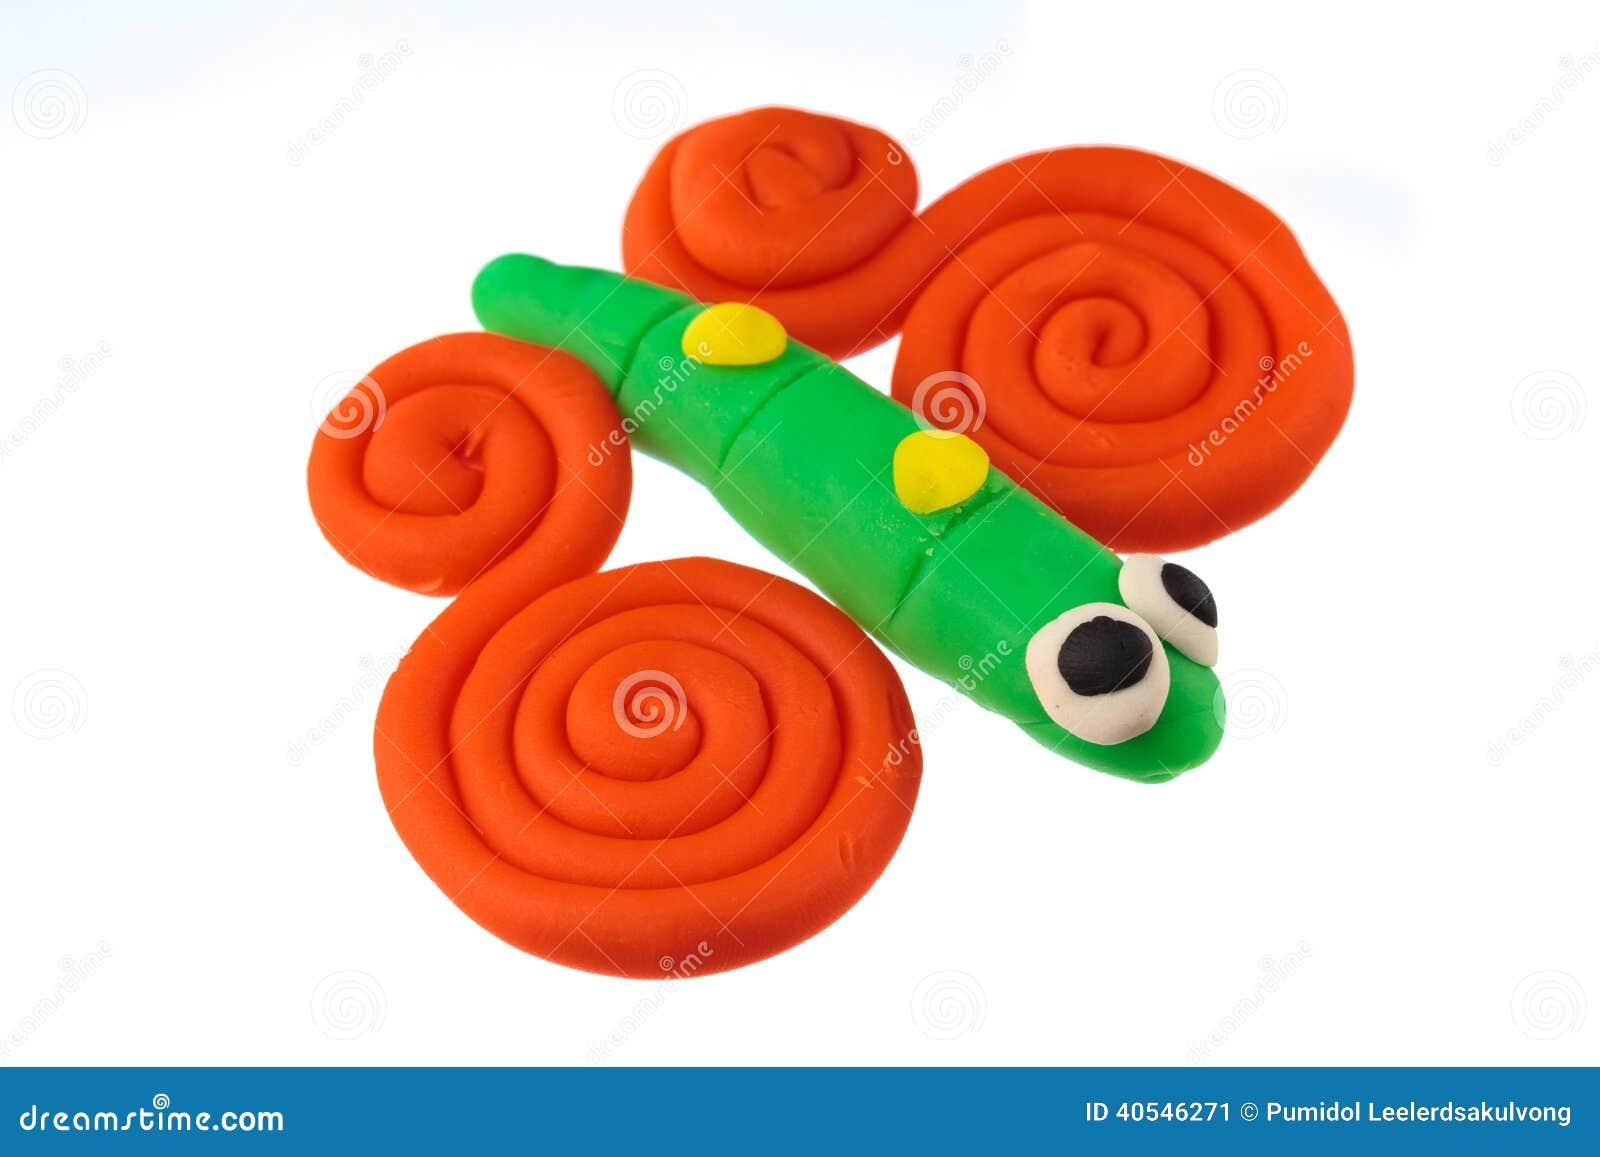 Play Dough Animal Stock Photo - Image: 40546271